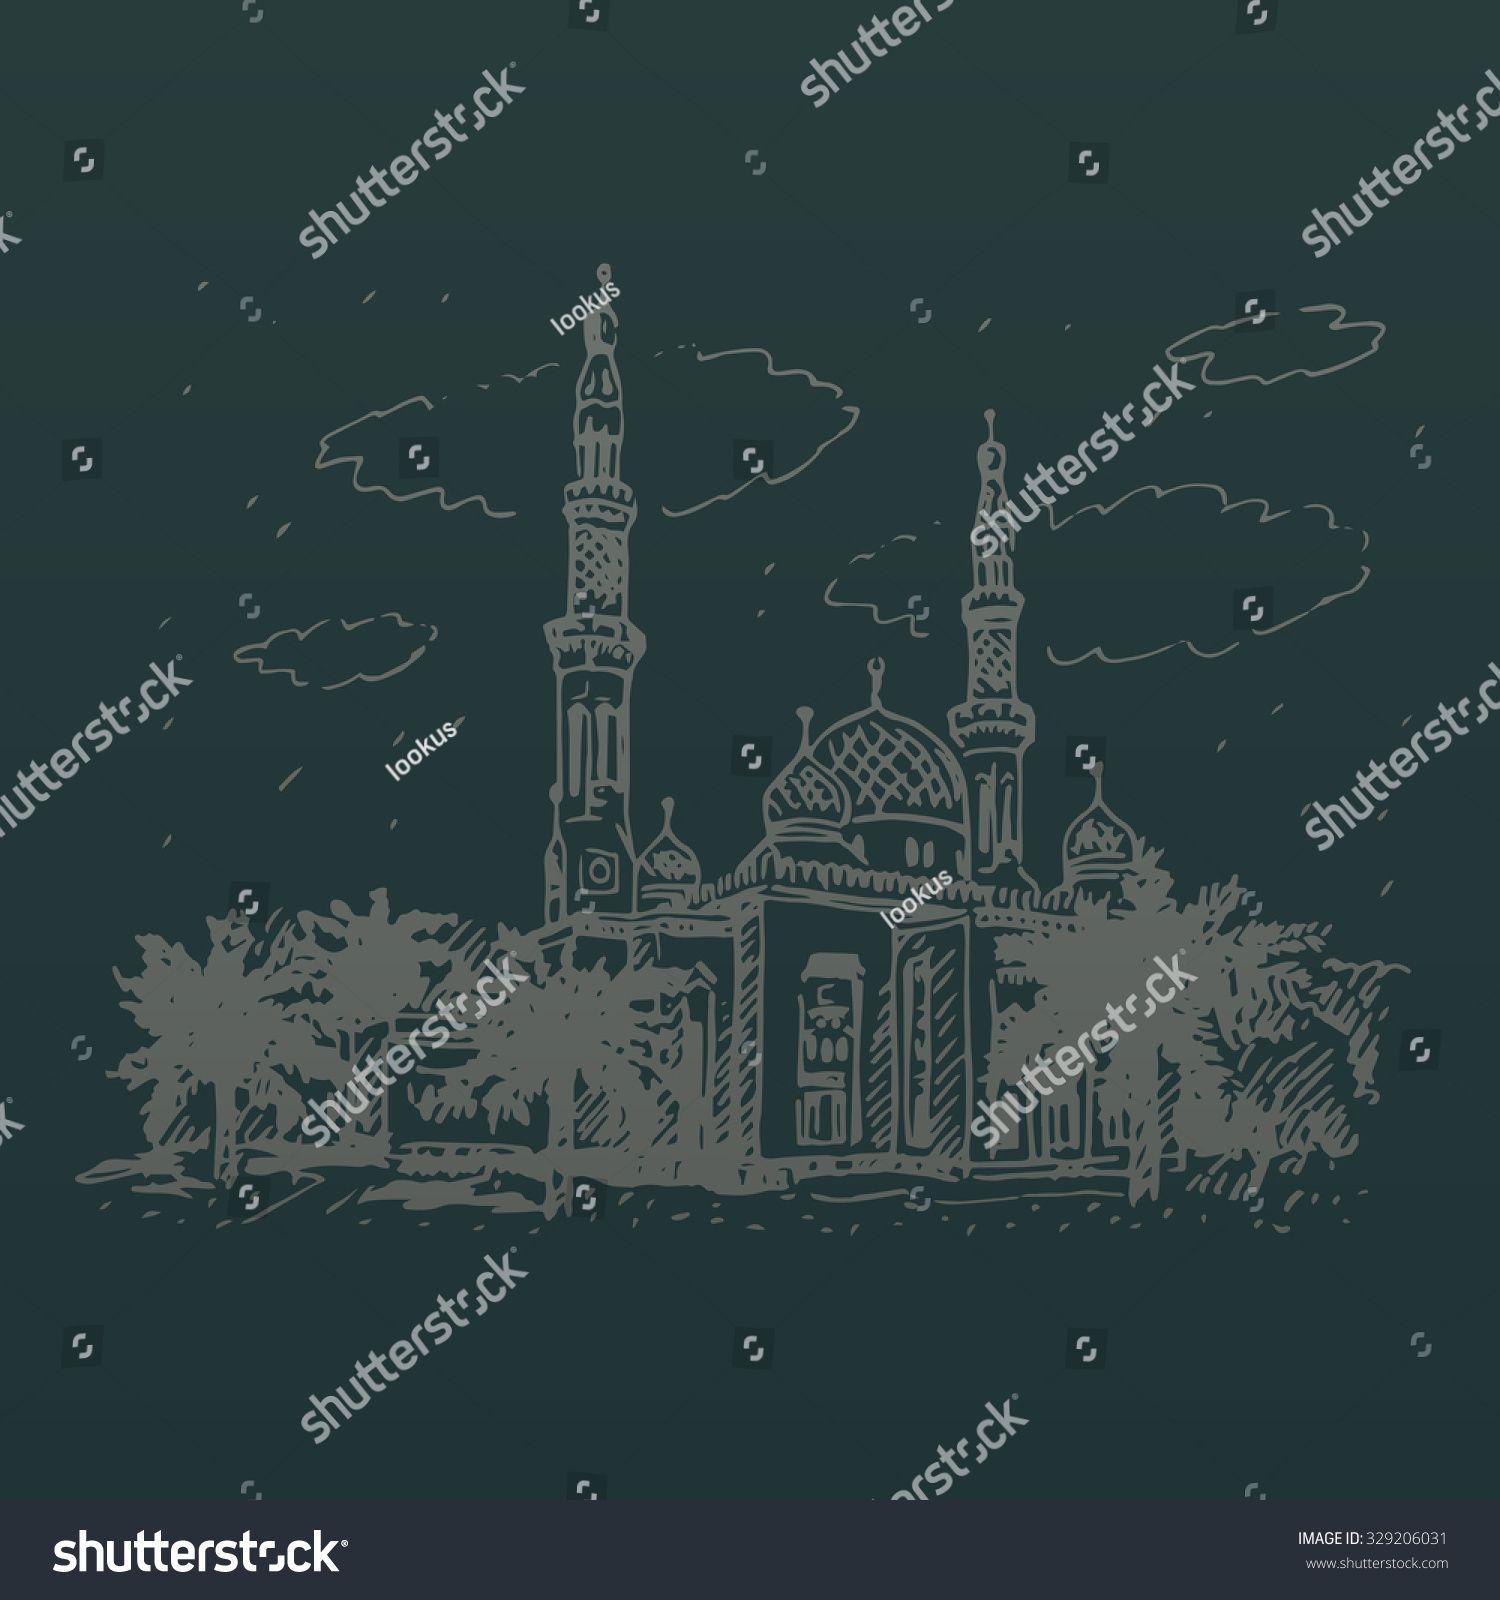 Jumeirah Mosque in Dubai, UAE. Vector hand drawn sketch. #Sponsored , #Affiliate, #Dubai#UAE#Jumeirah#Mosque